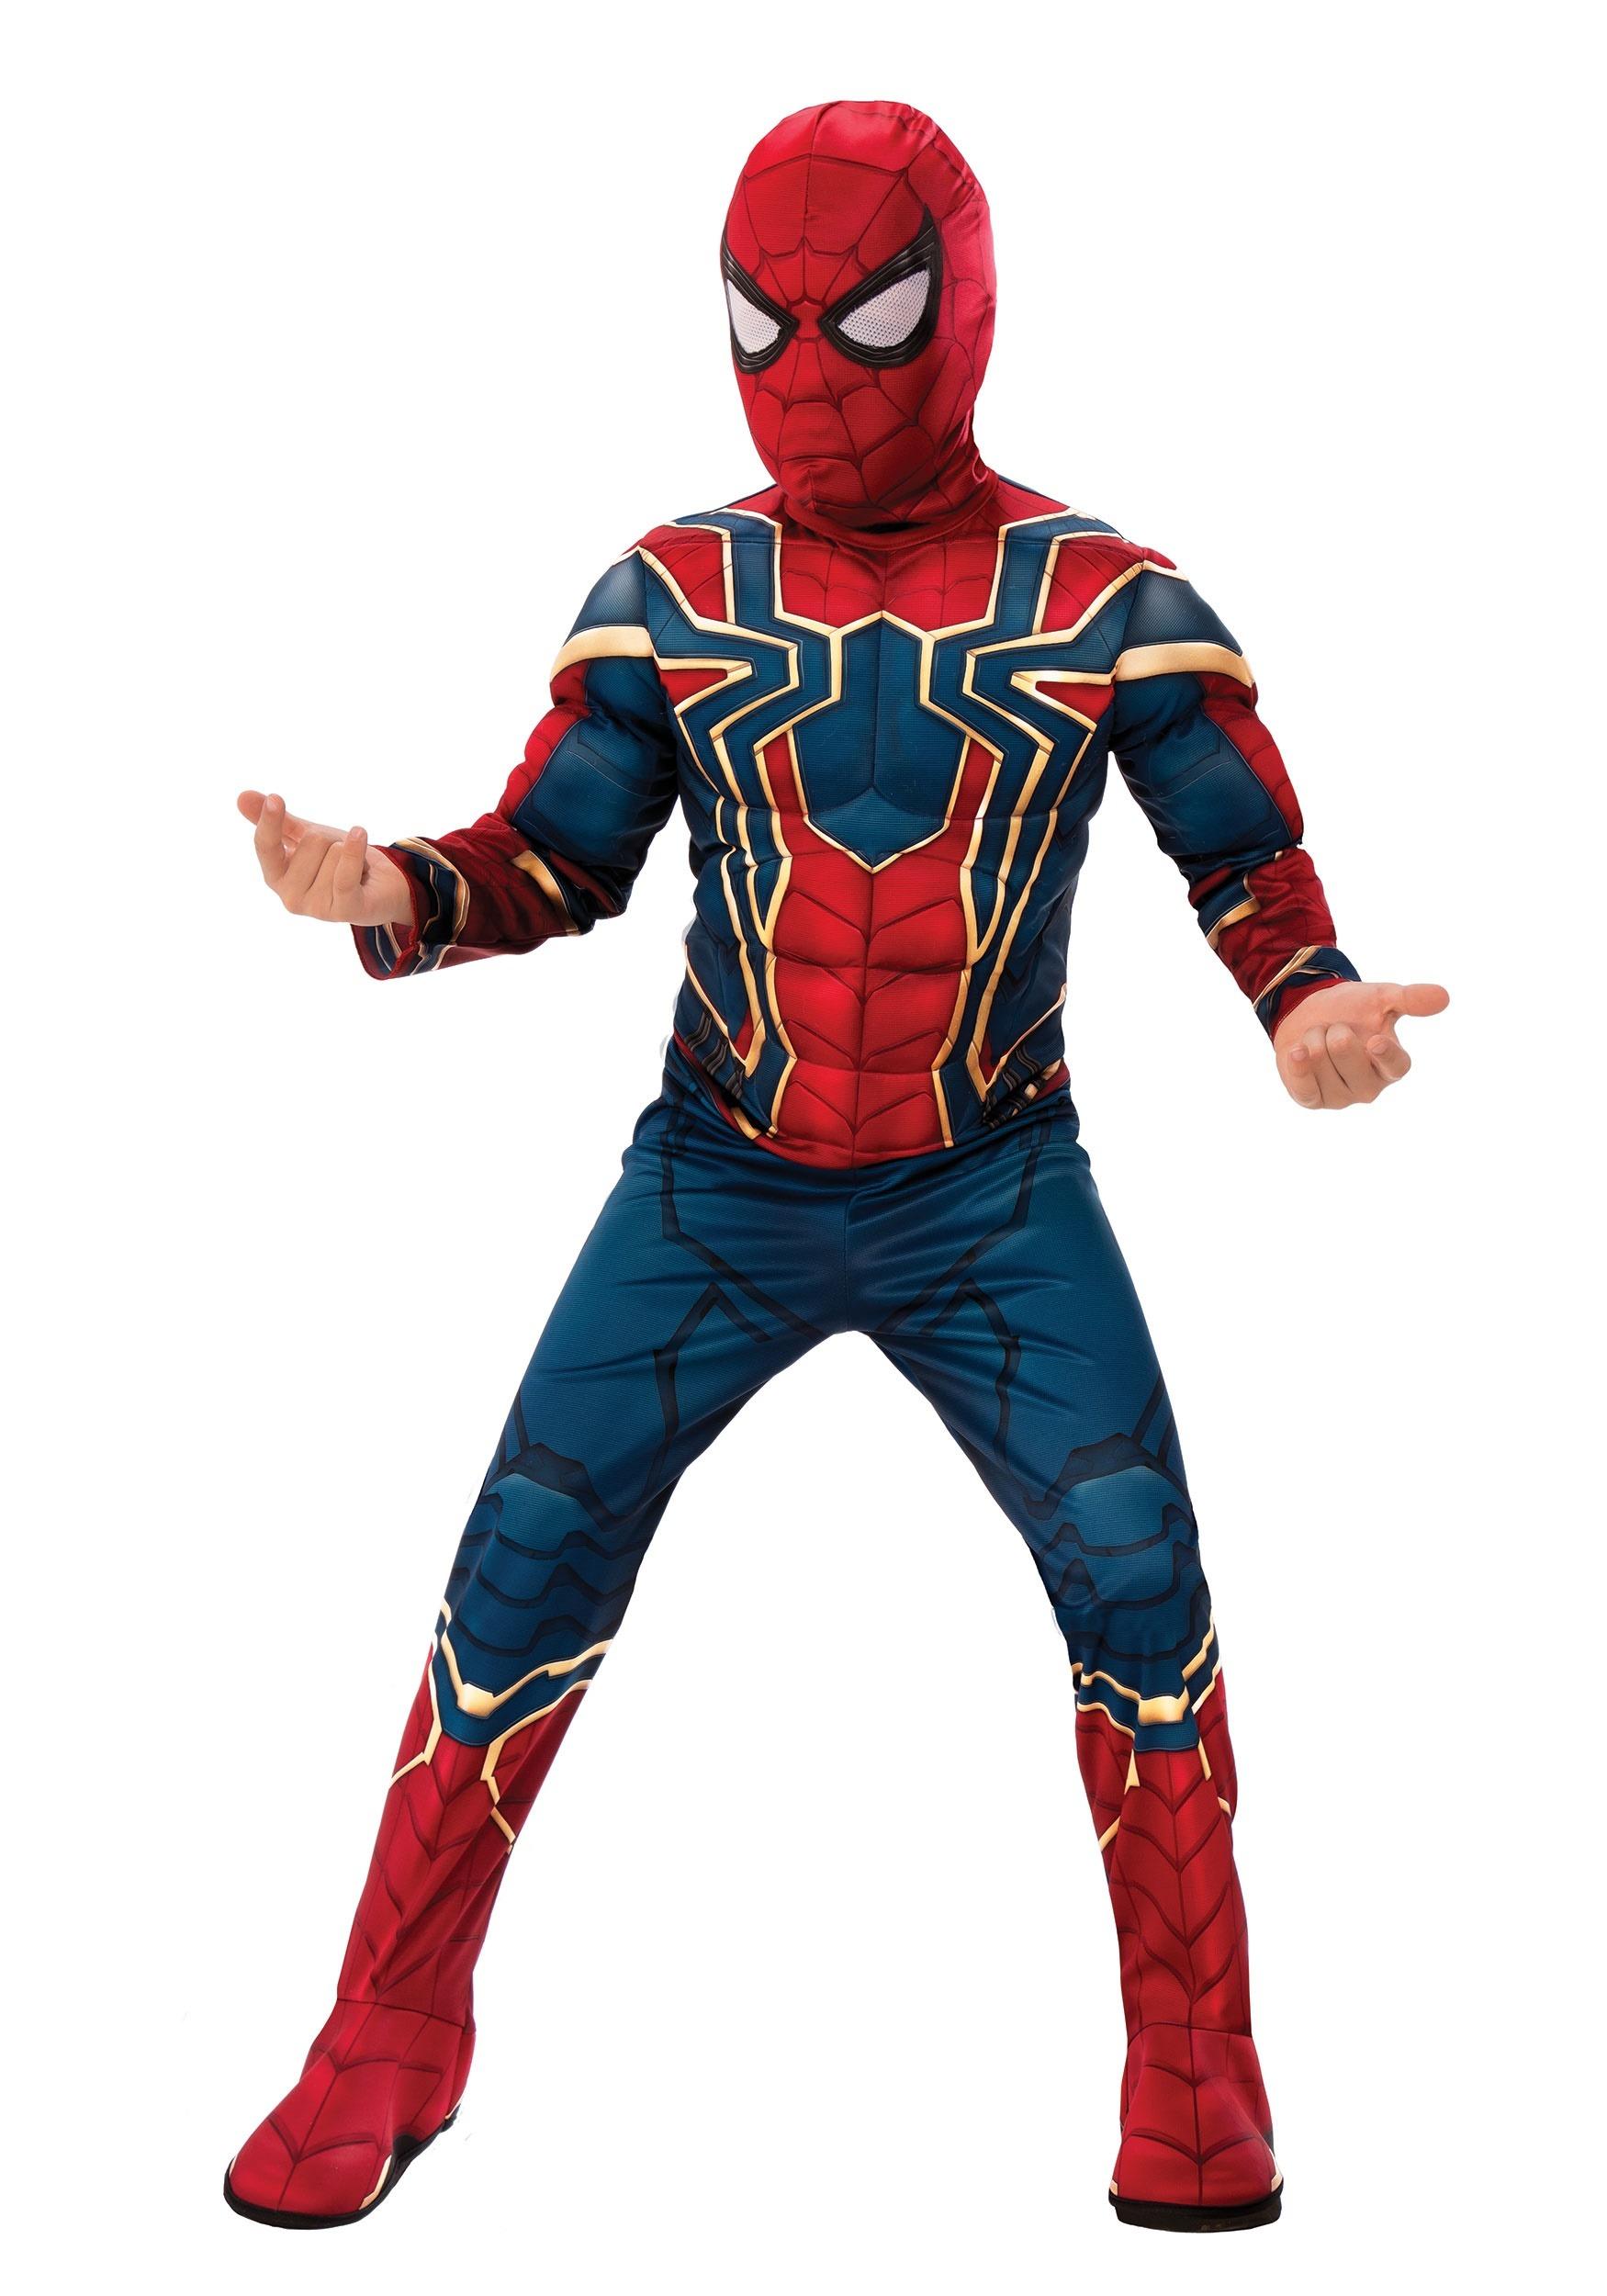 Marvel Infinity War Deluxe Iron Spider Costume for Kids